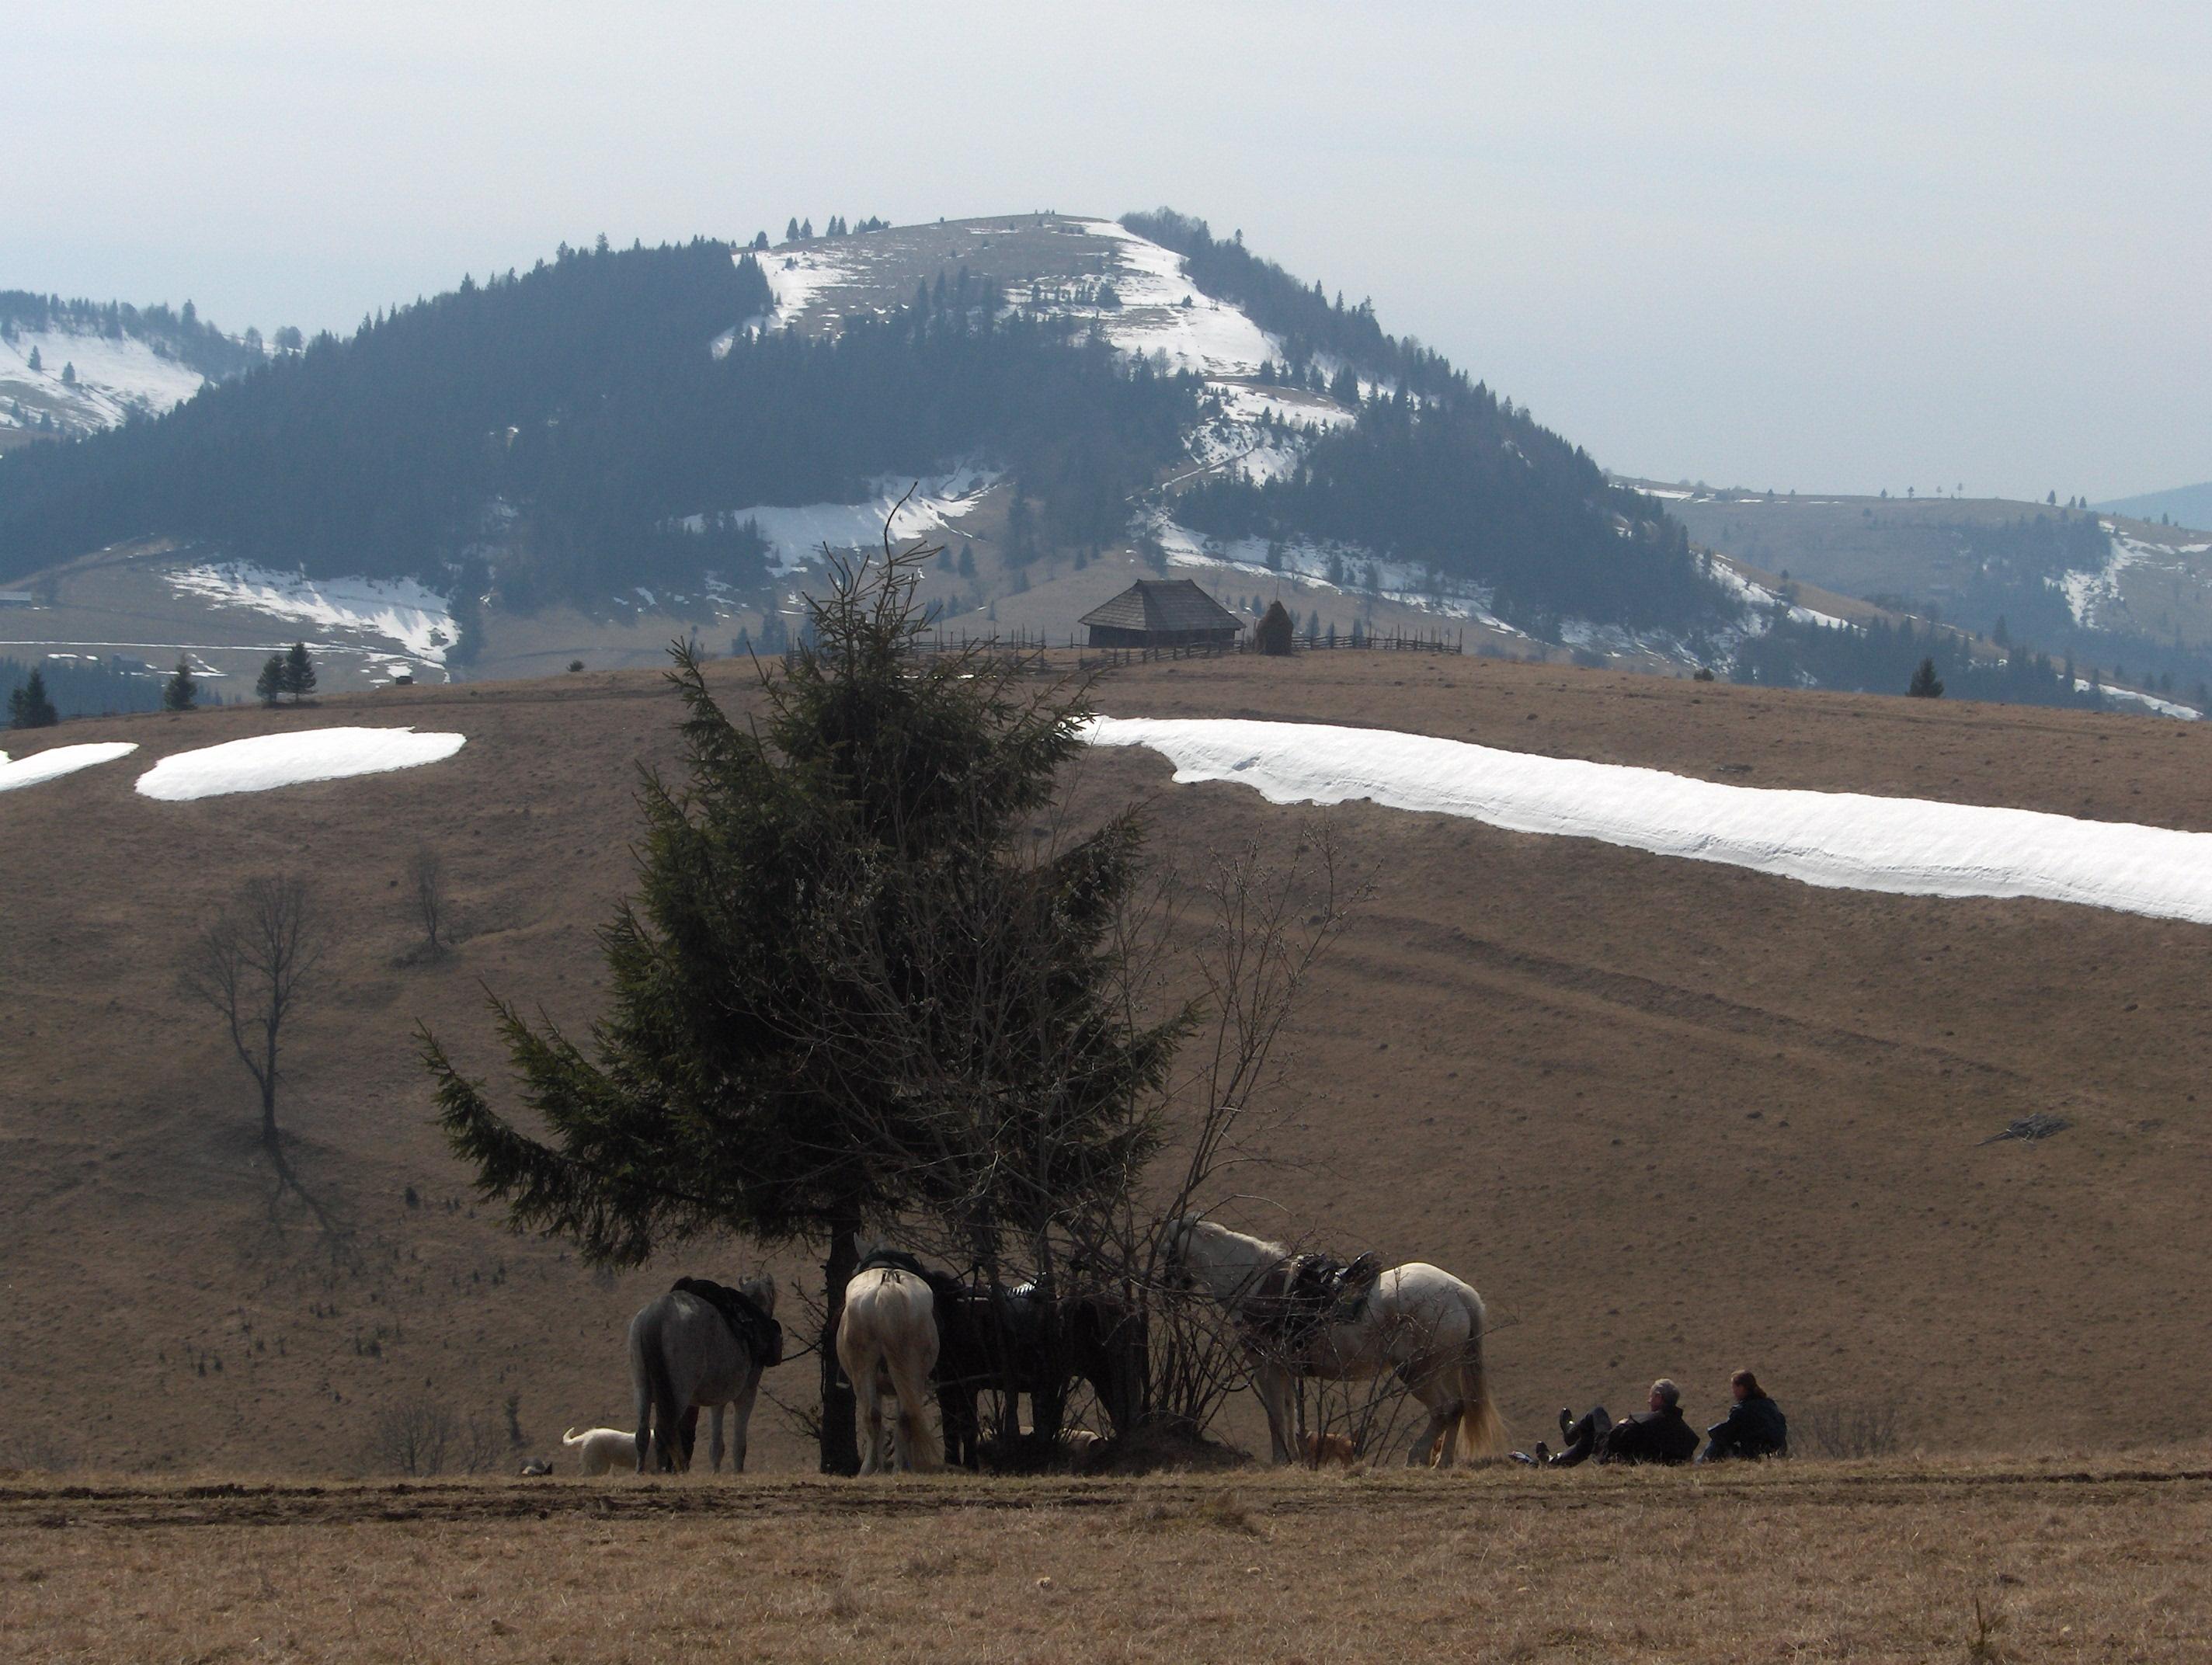 White Horse Pilgrim Trail Riding Gear